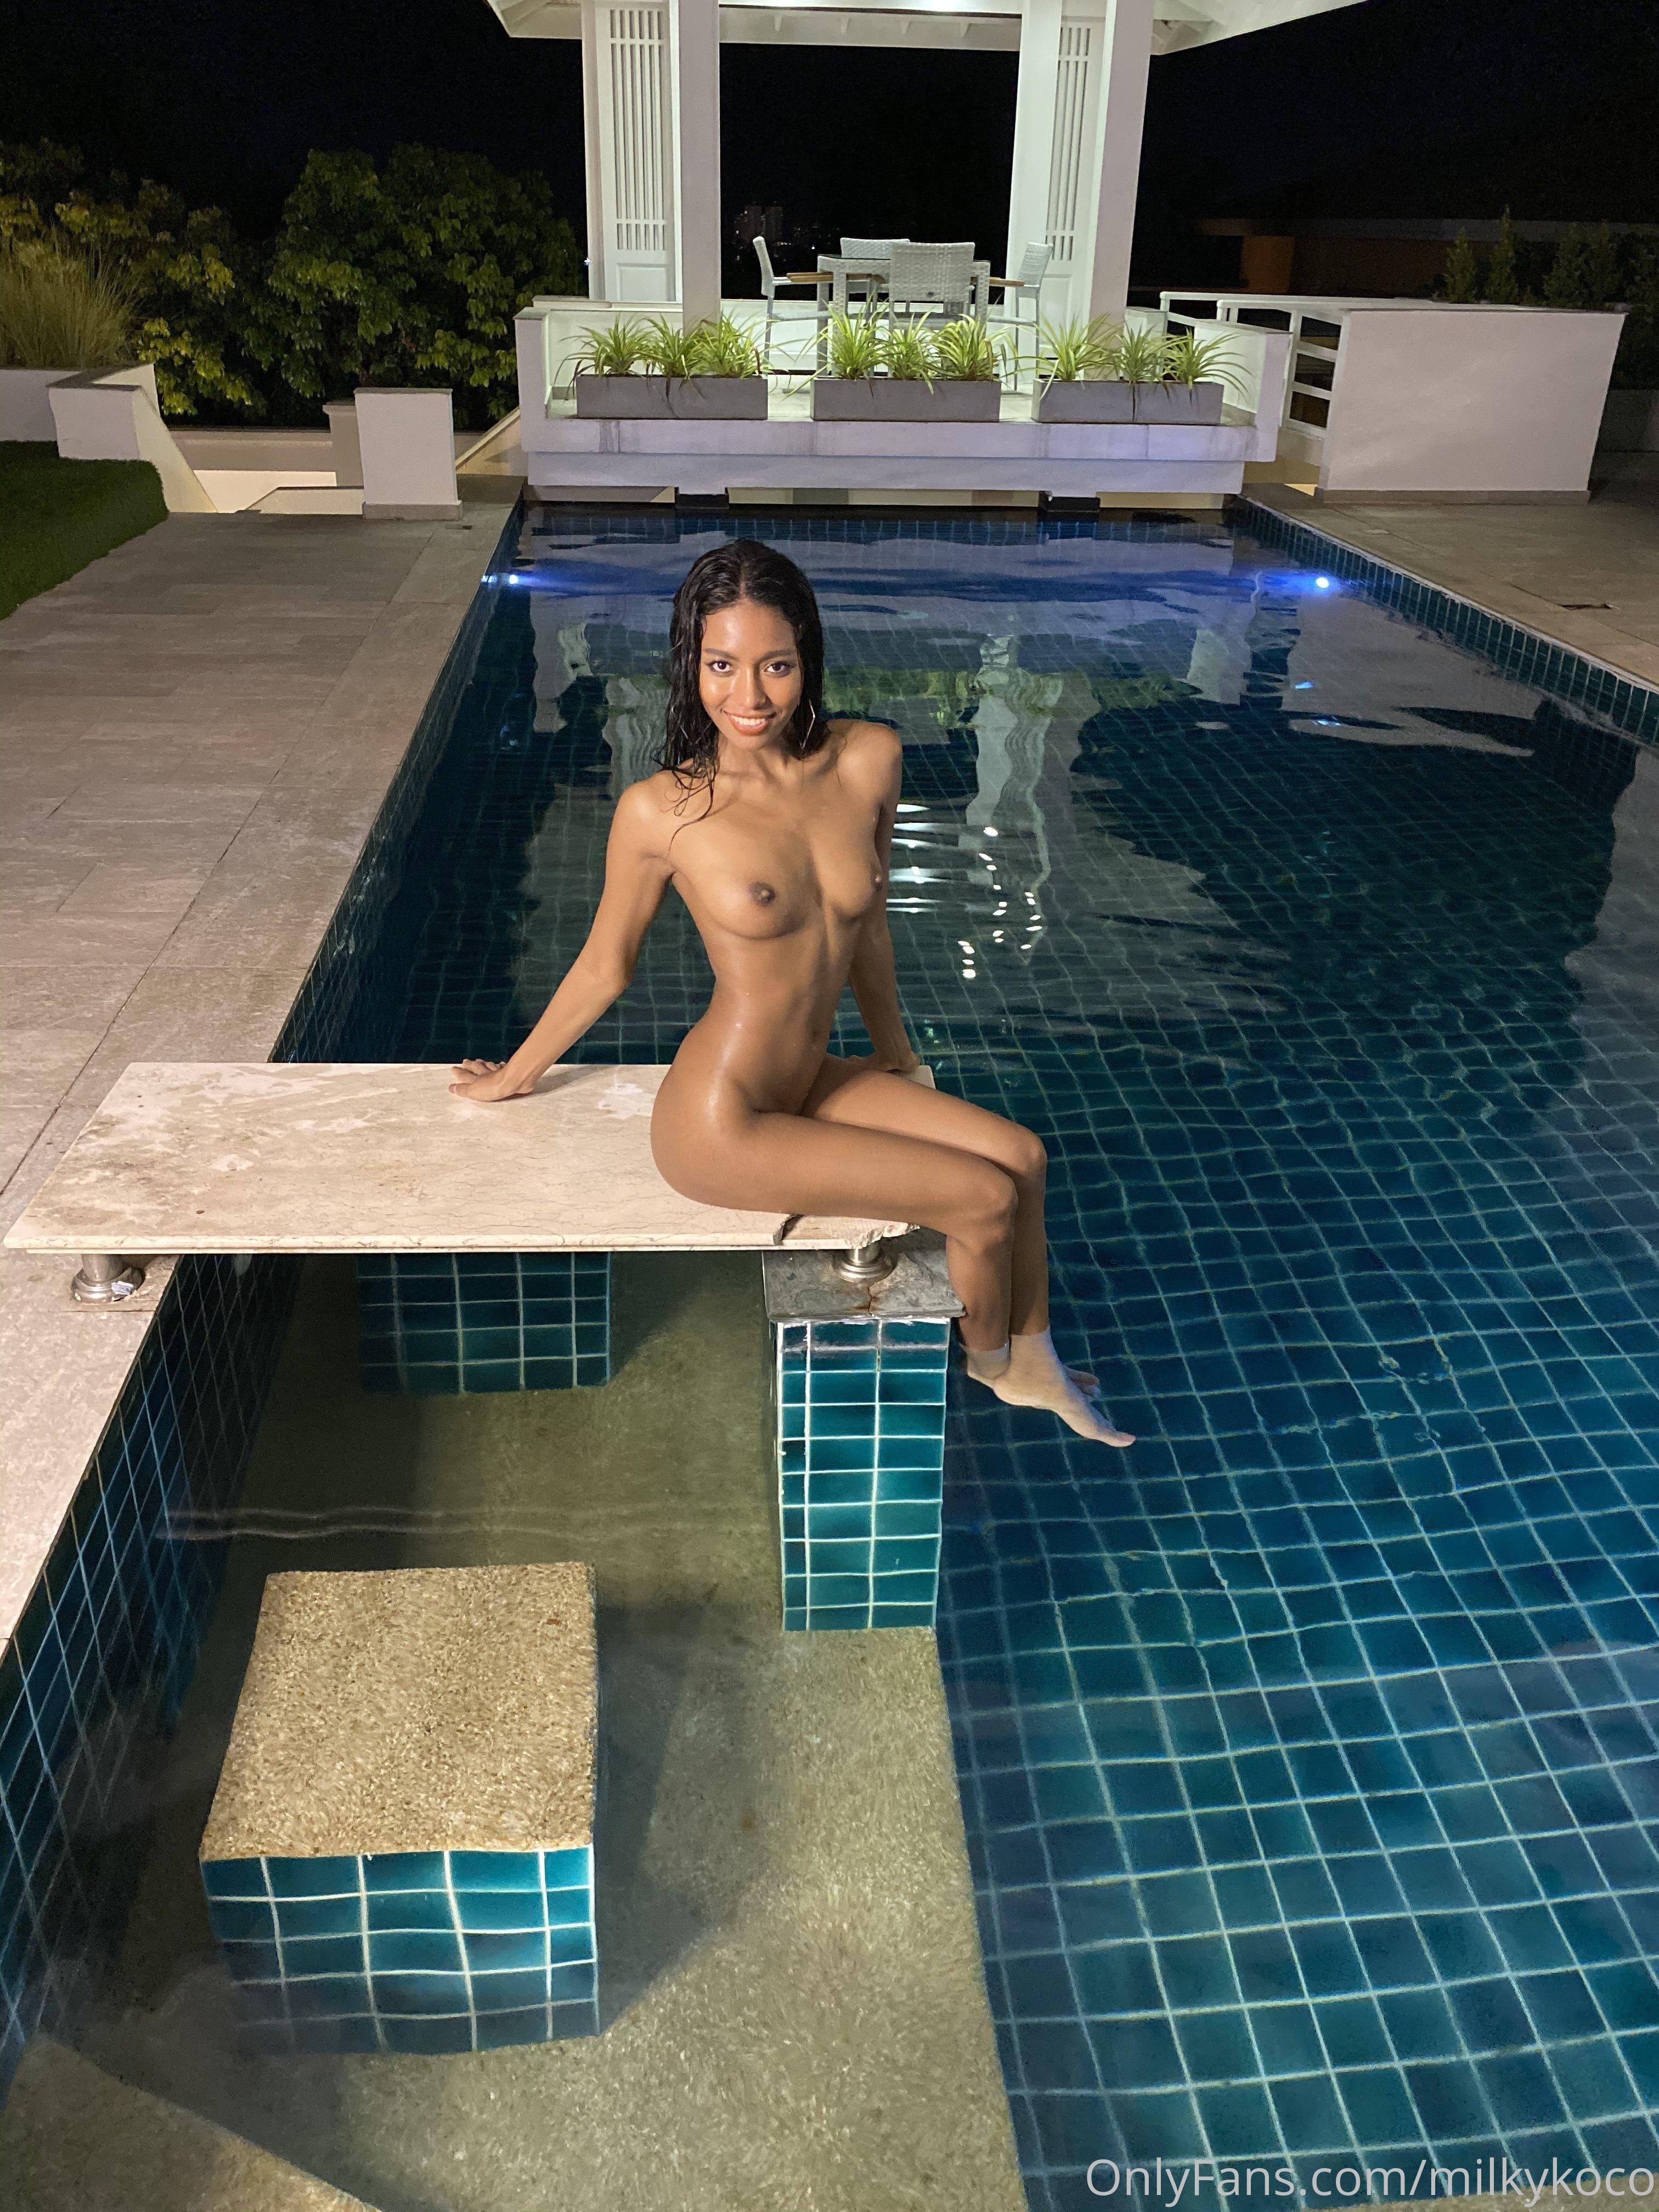 Koko Mylk Bangkok Model Leaked Onlyfans 0063